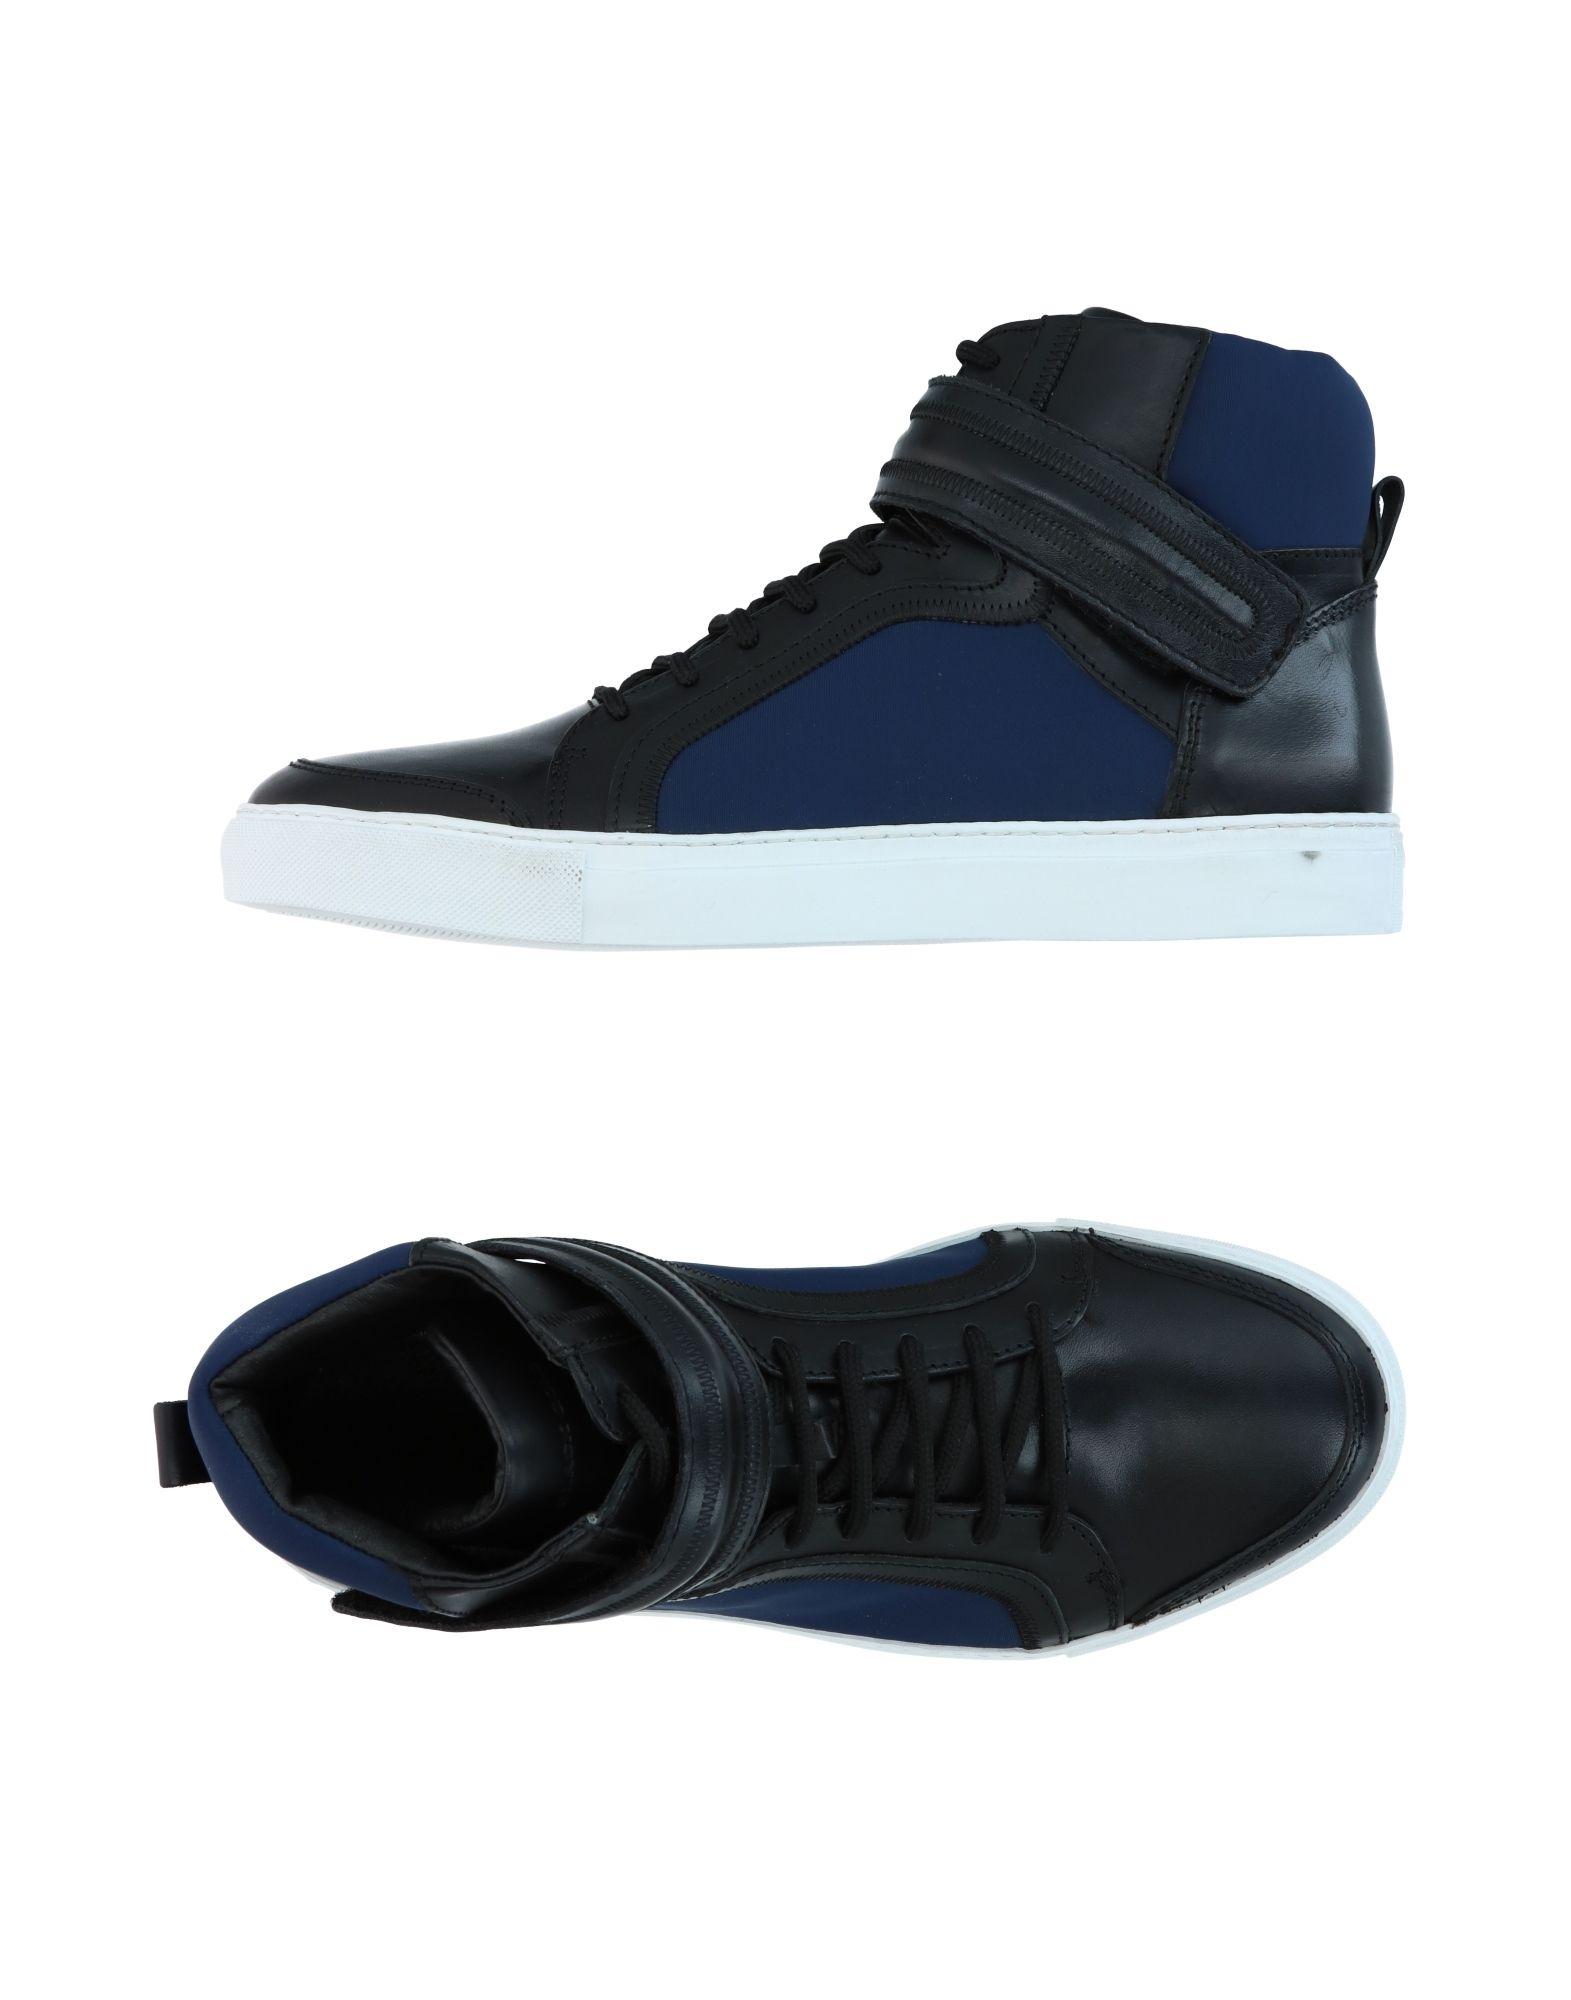 DIESEL BLACK GOLD Herren High Sneakers & Tennisschuhe Farbe Blau Größe 9